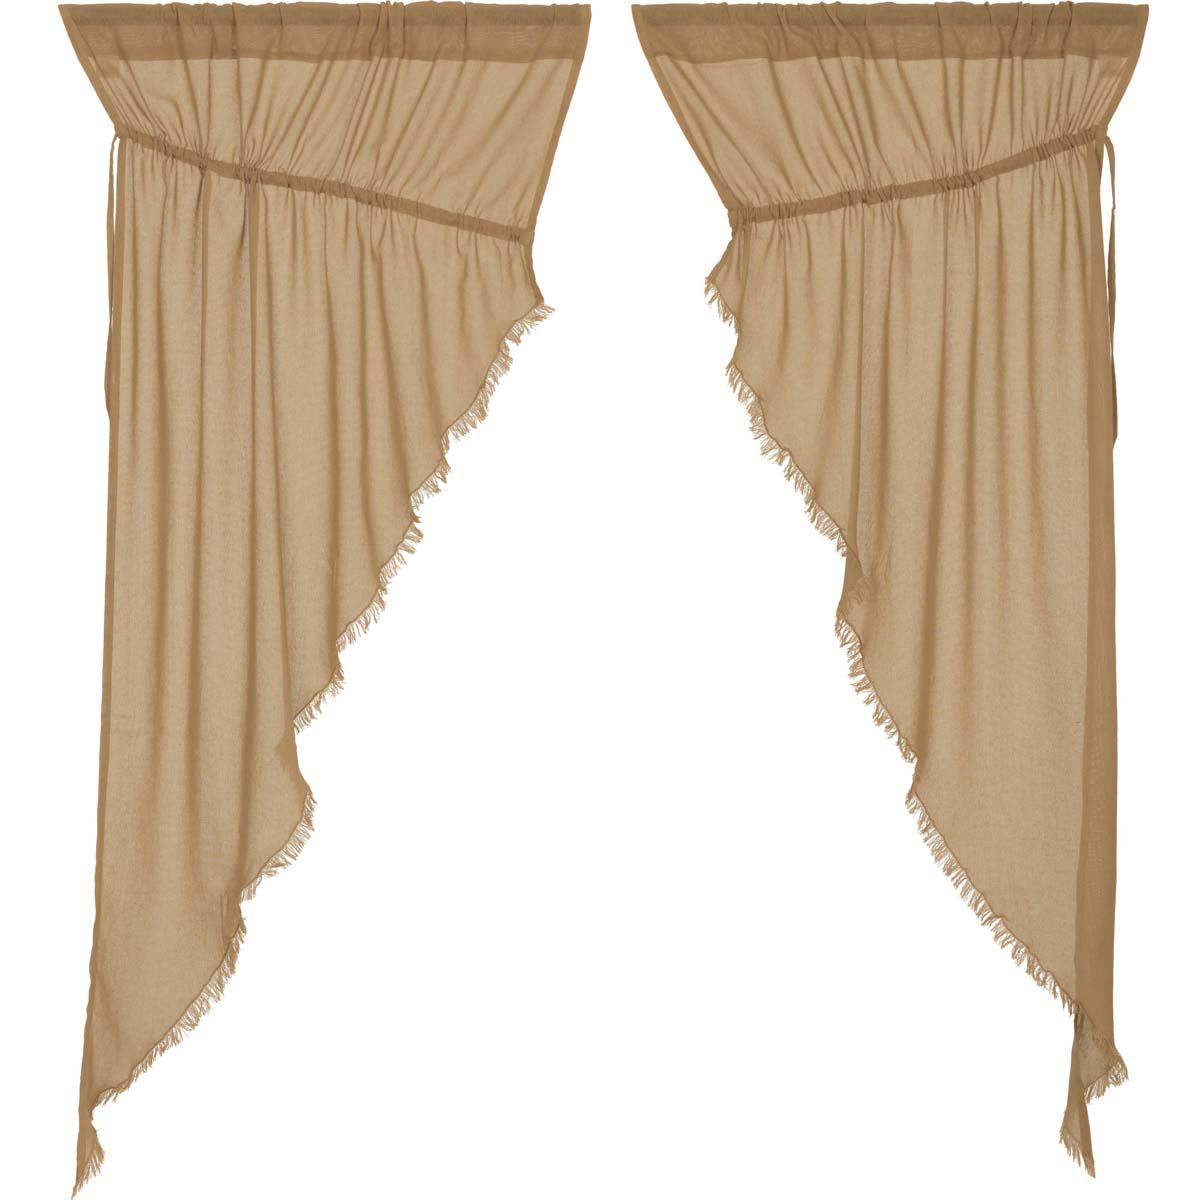 Tobacco Cloth Khaki Prairie Short Panel Curtain Fringed Set of 2 63x36x18